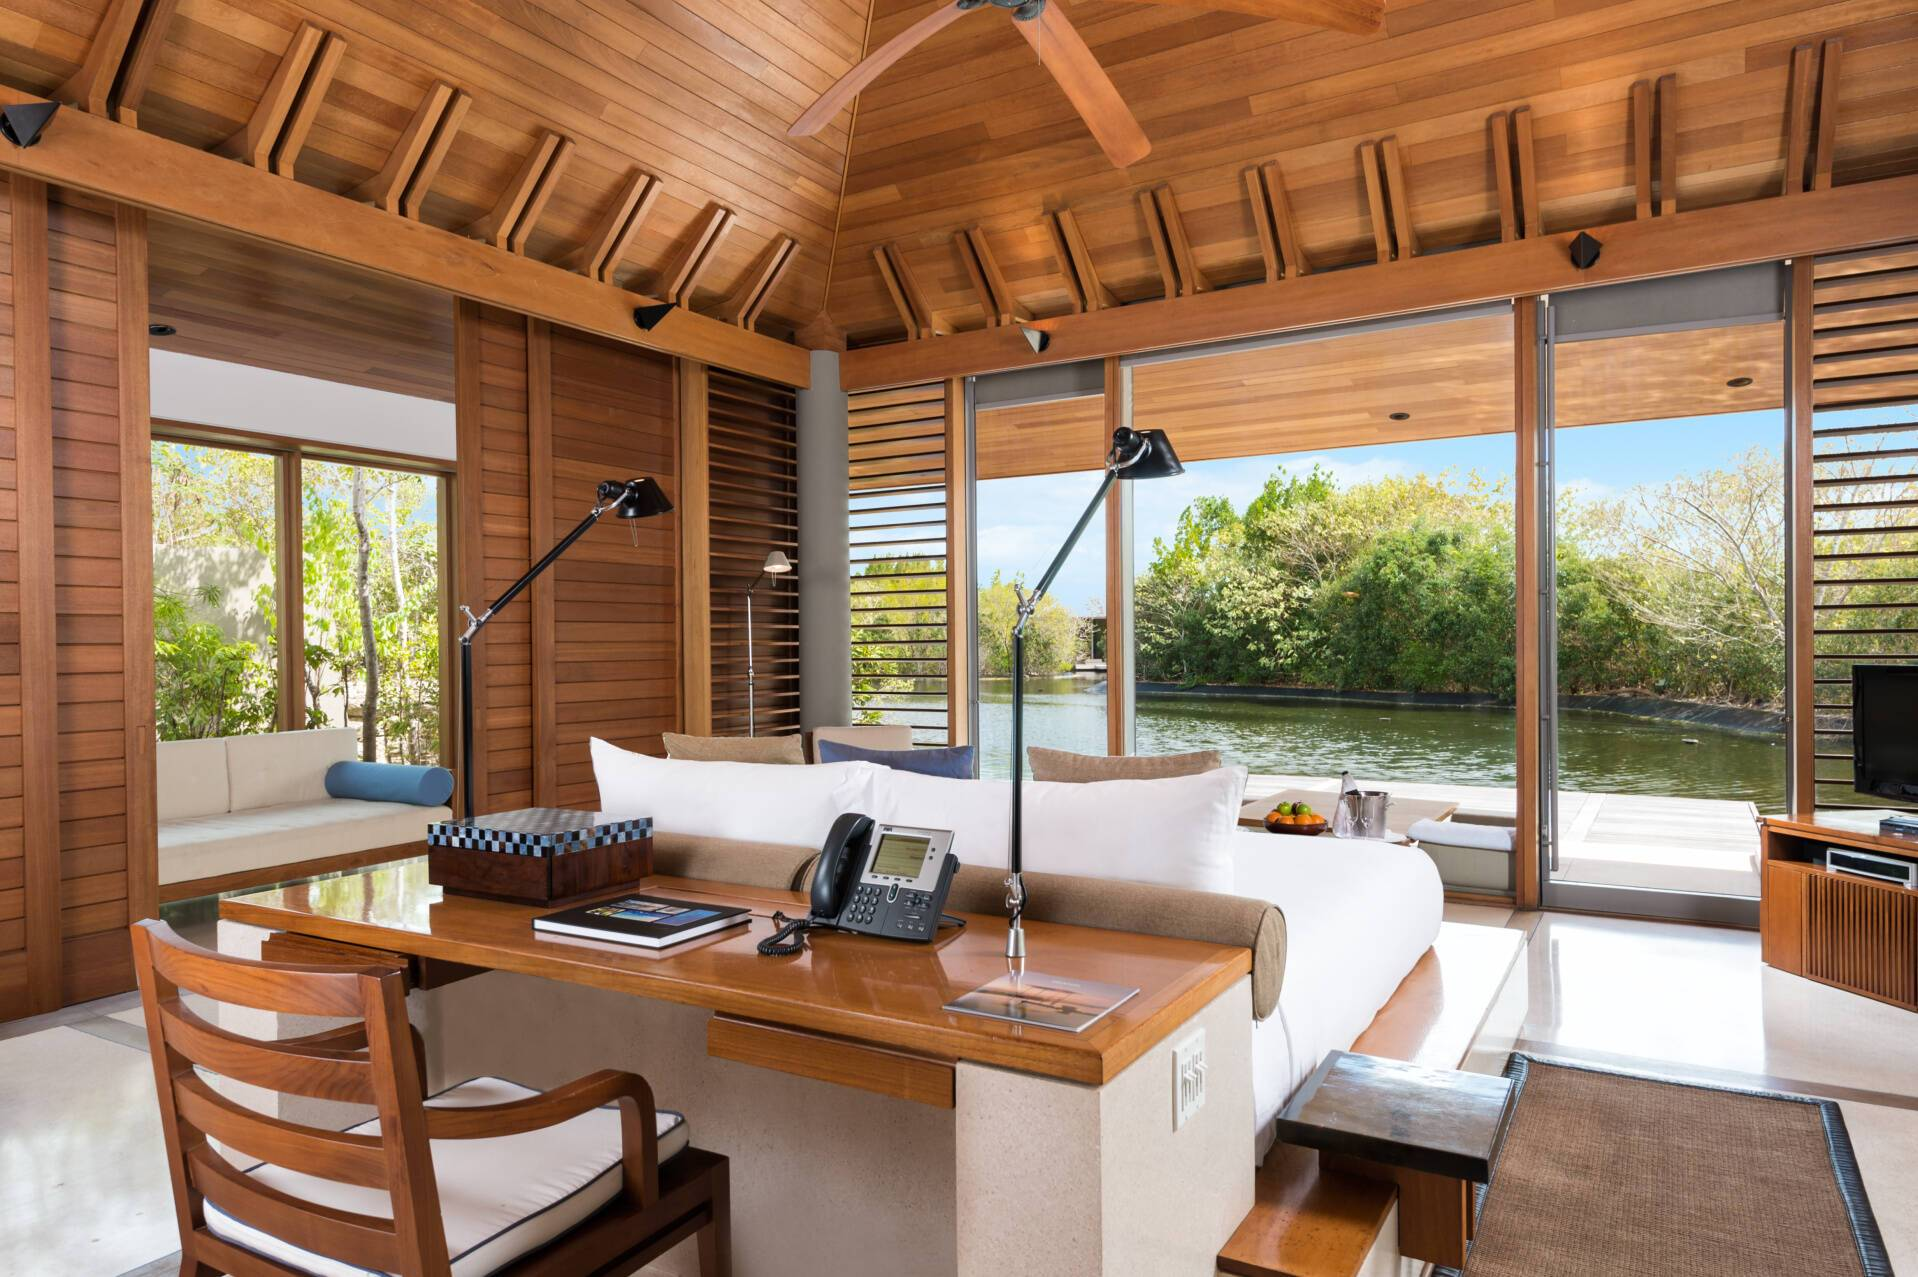 Amanyara Pavilion Chambre Turks et Caicos